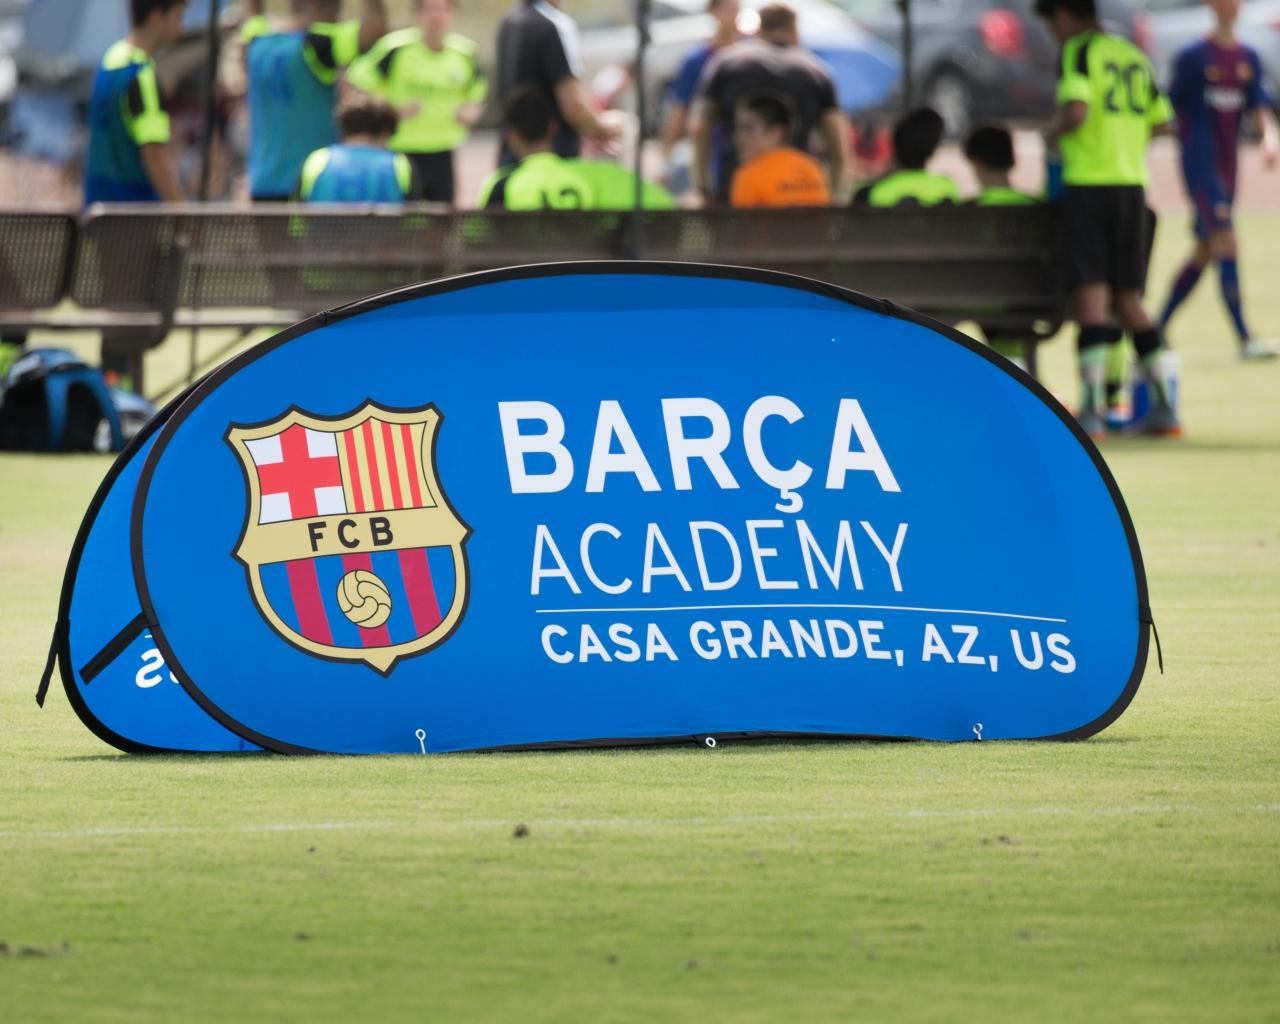 Fc Barcelona Soccer Camp In The Usa Barca Football Camp 2019